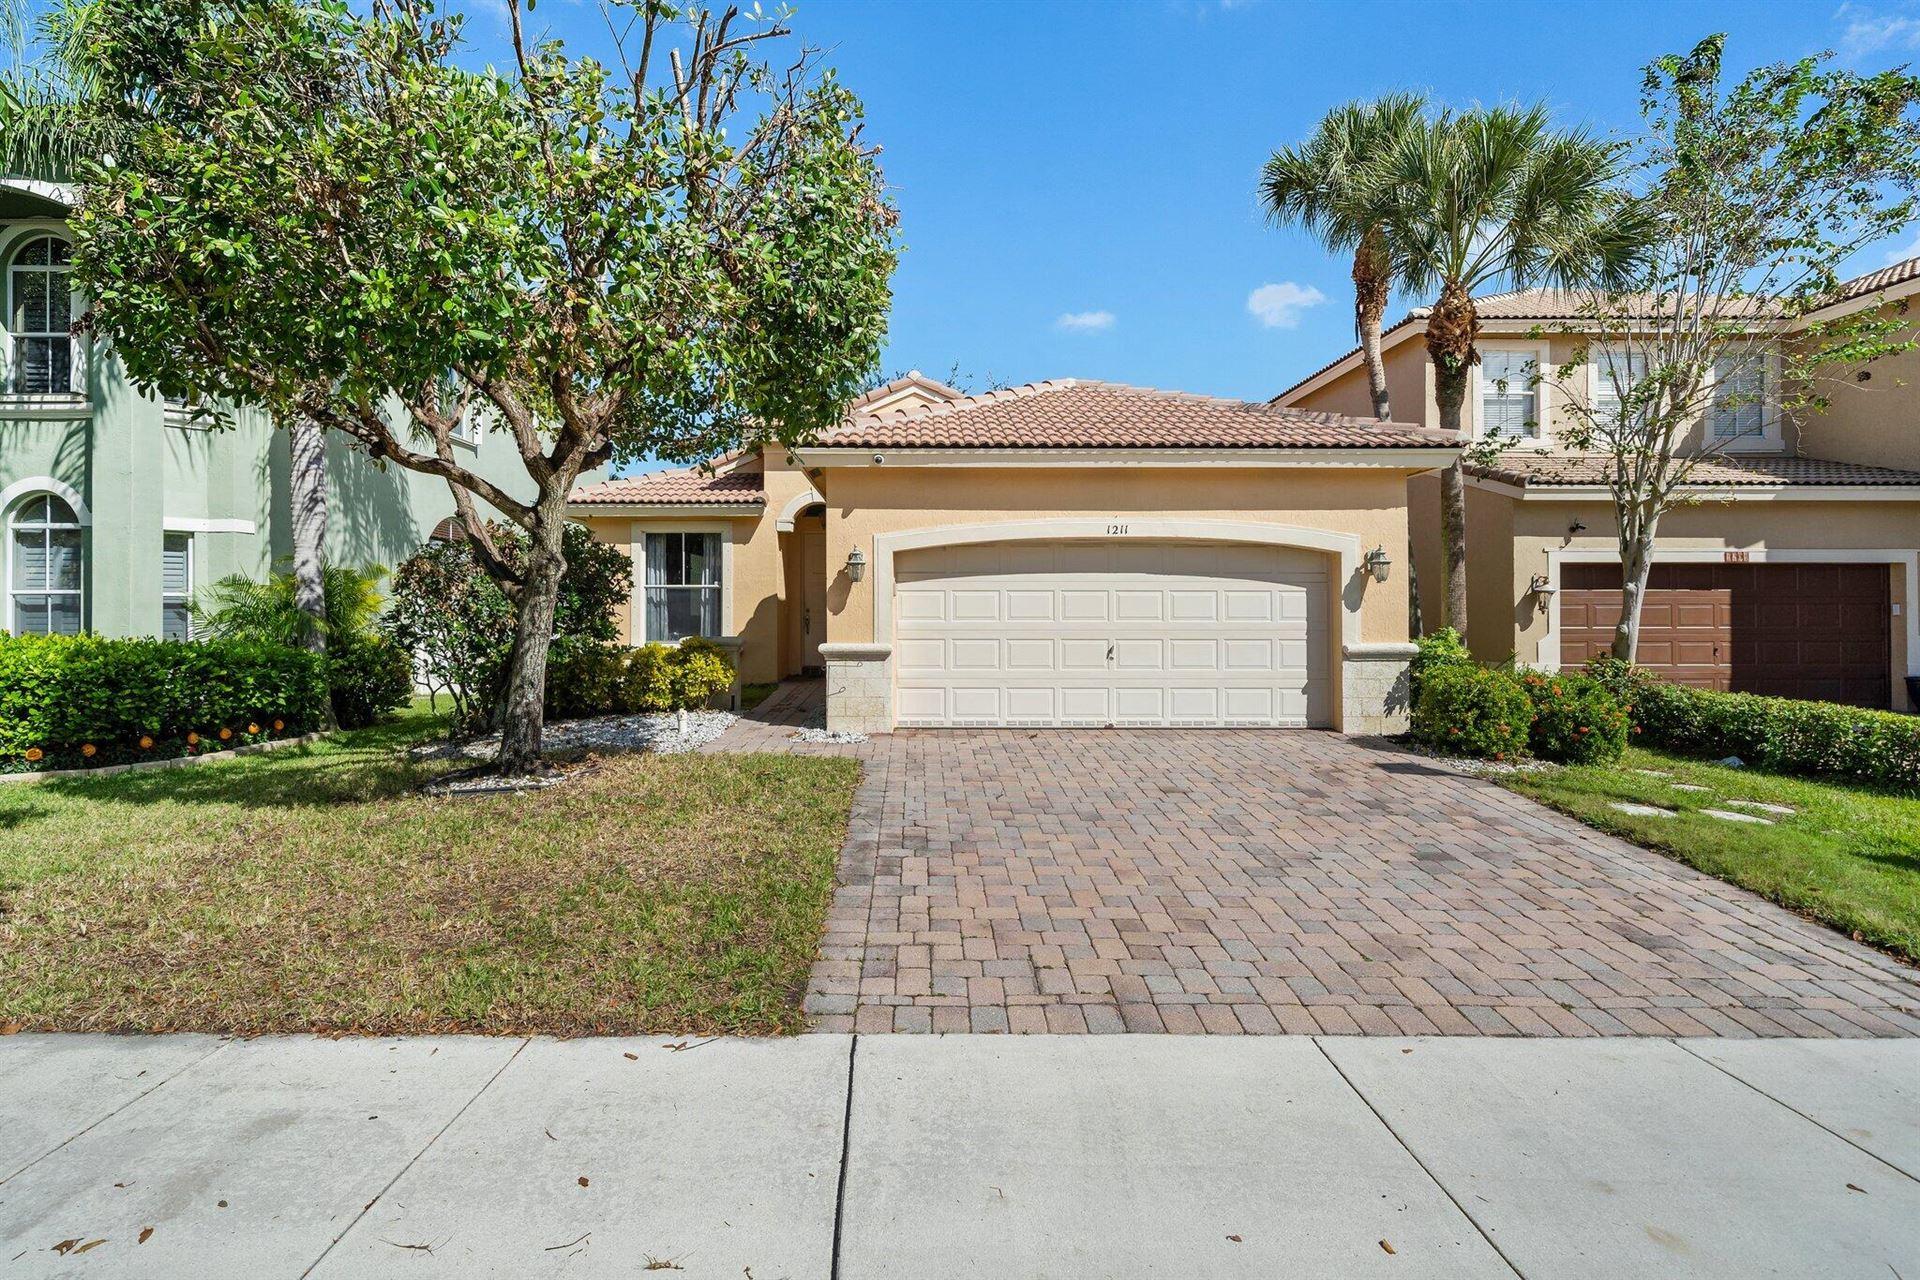 Photo of 1211 W Magnolia Circle, Delray Beach, FL 33445 (MLS # RX-10753034)